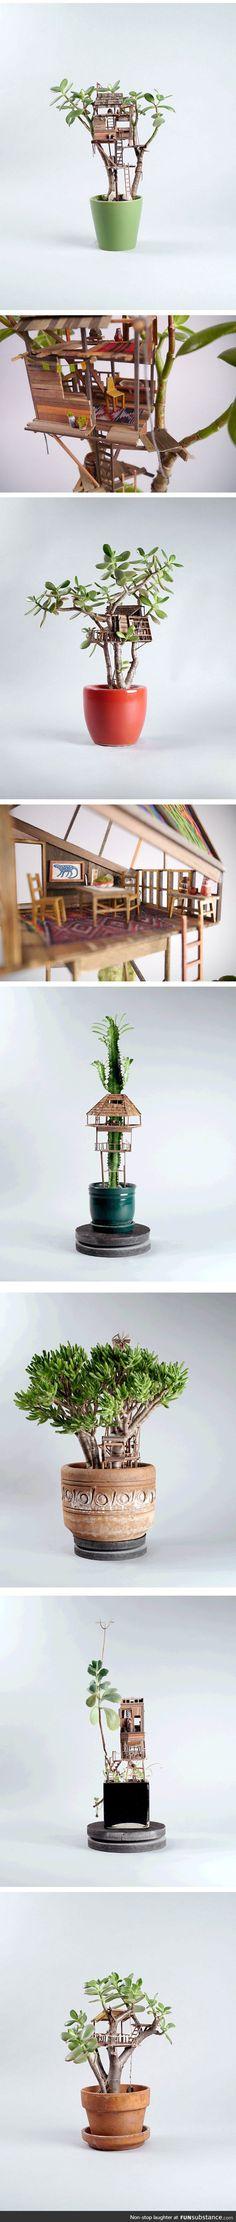 Also a super cute doll house!::: Miniature Tree Houses Make Houseplants Way More Interesting Miniature Trees, Miniature Houses, Fairy Houses, Tree Houses, Decor Terrarium, Decoration Plante, Deco Originale, House Made, Little Houses